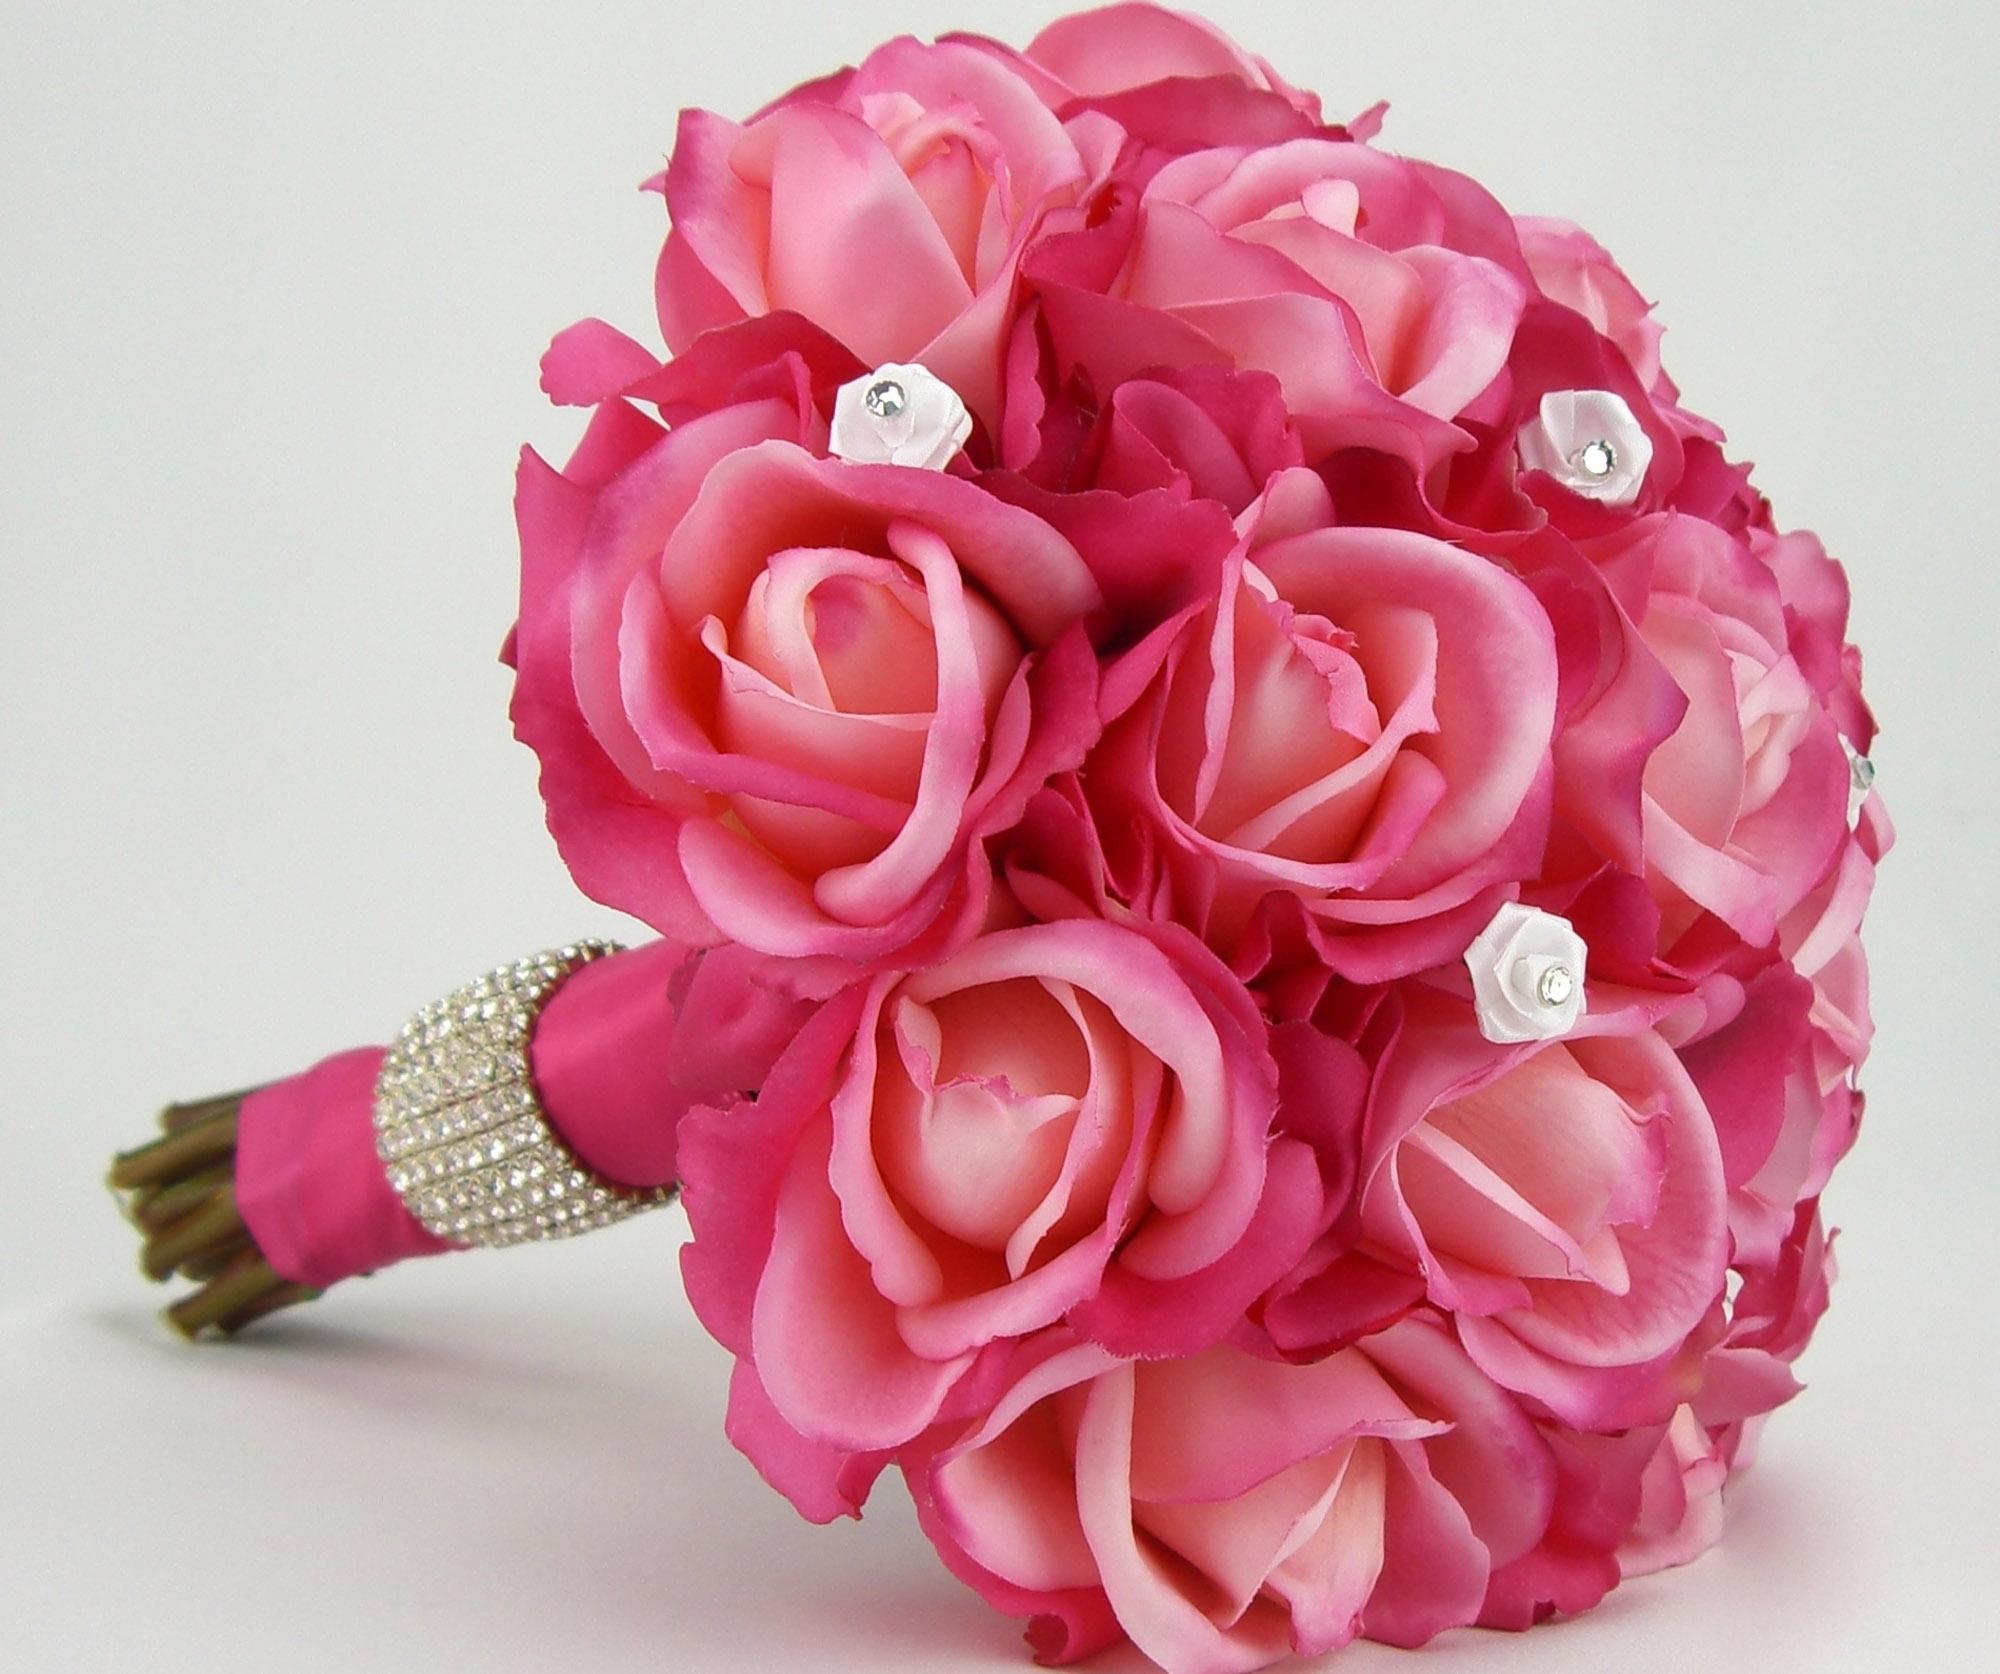 Roses-flowers-33698305-2000-1674